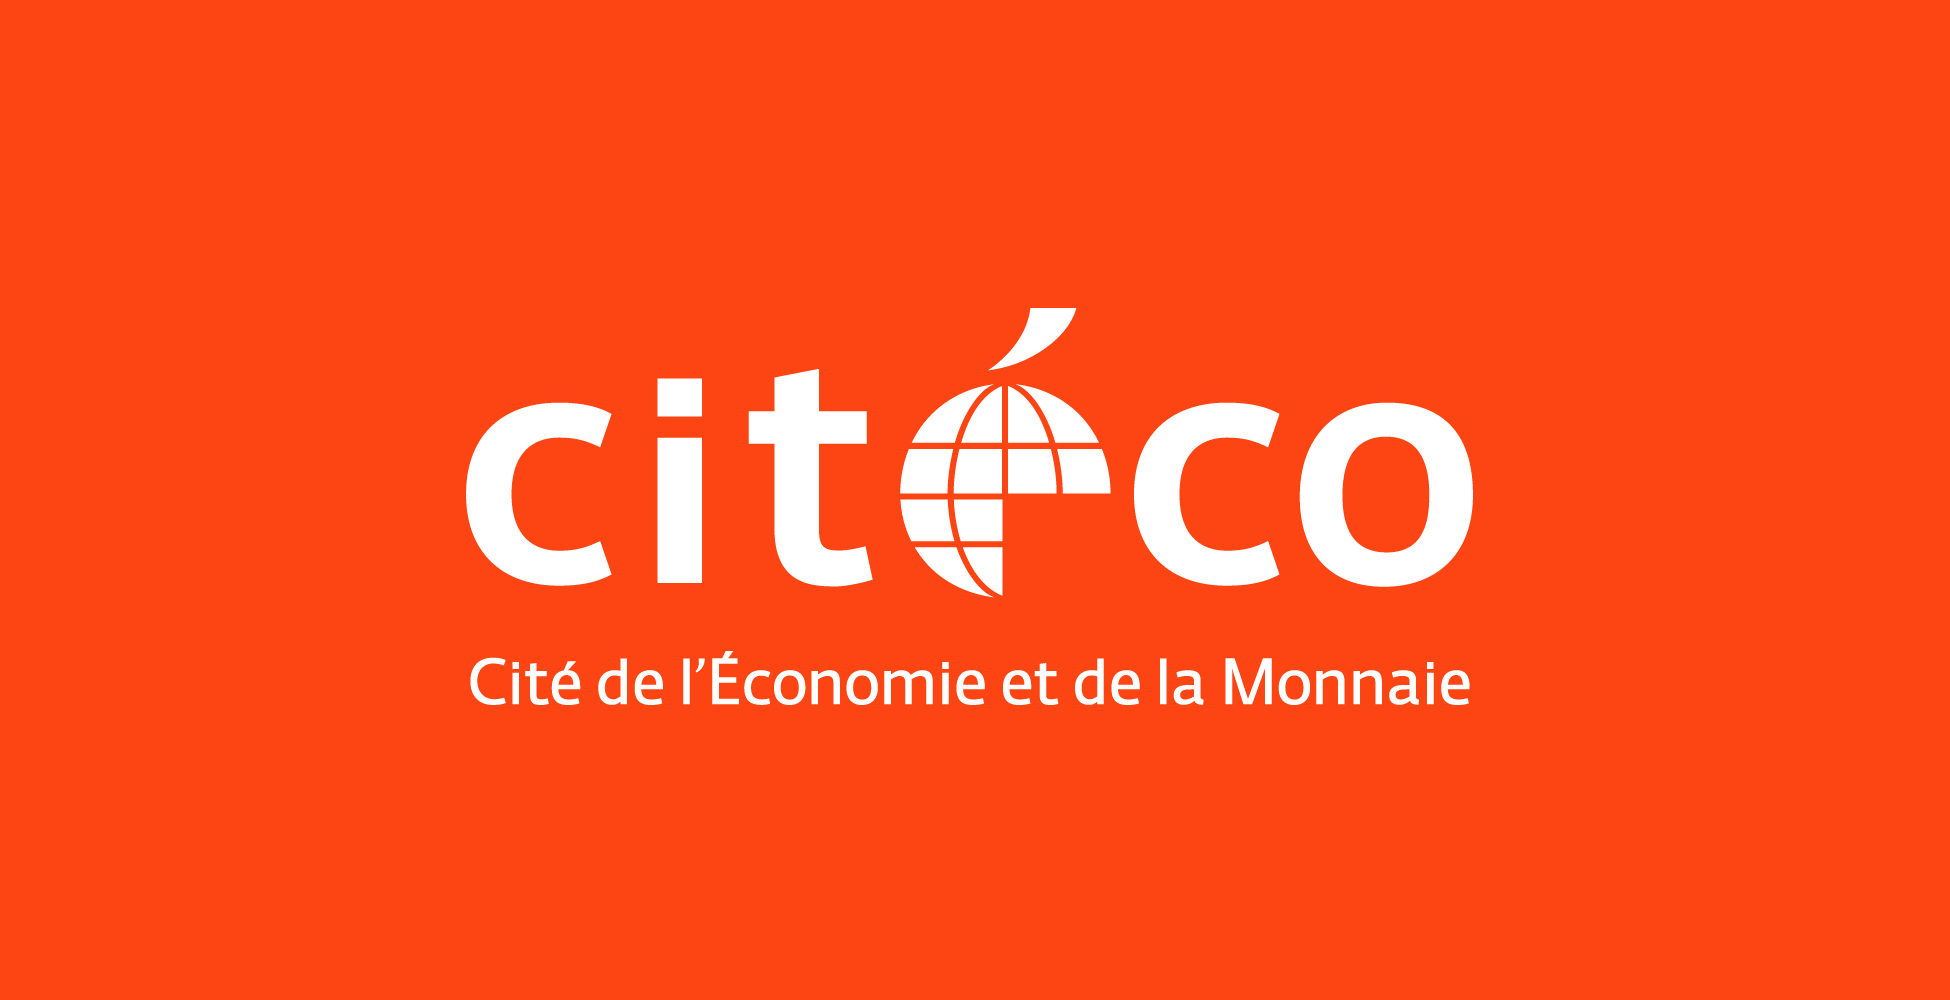 citeco_brand_design-08